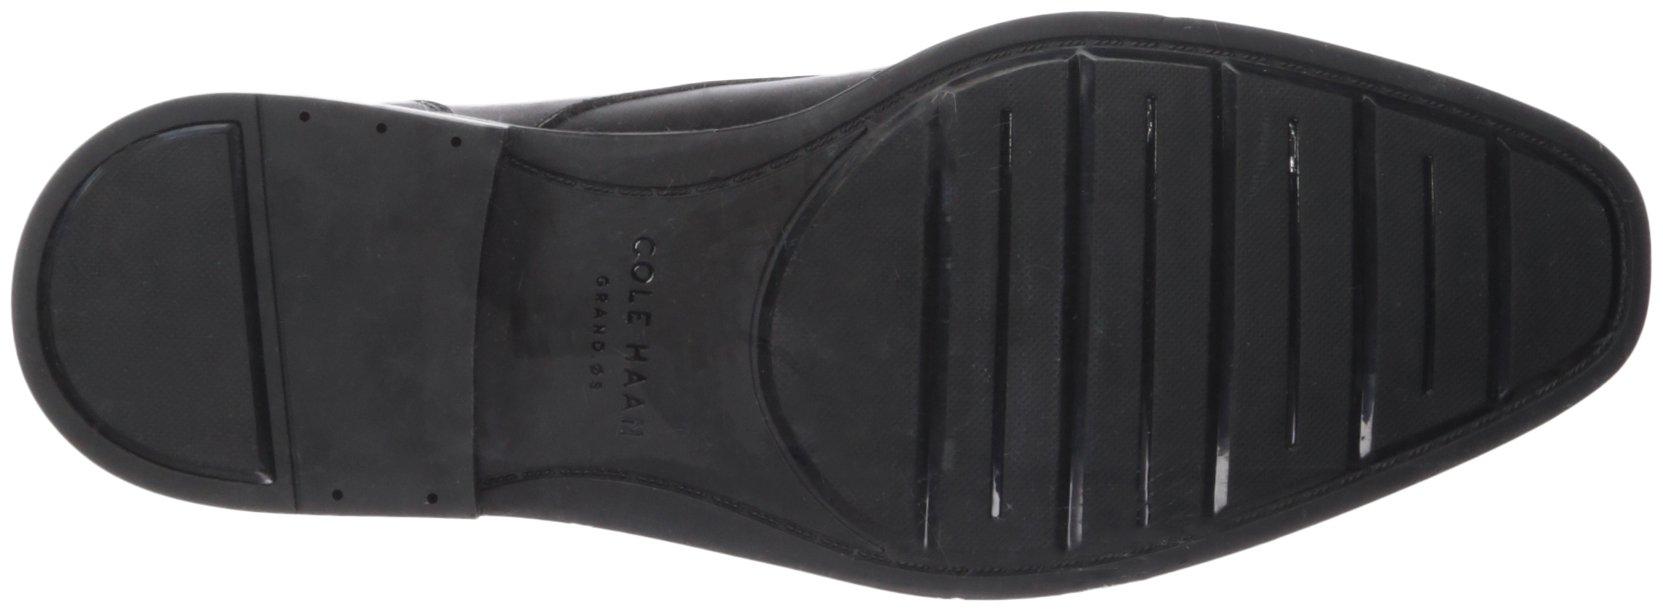 Cole Haan Men's Dawes Grand Plain Toe Oxford, Black, 11 Medium US by Cole Haan (Image #3)